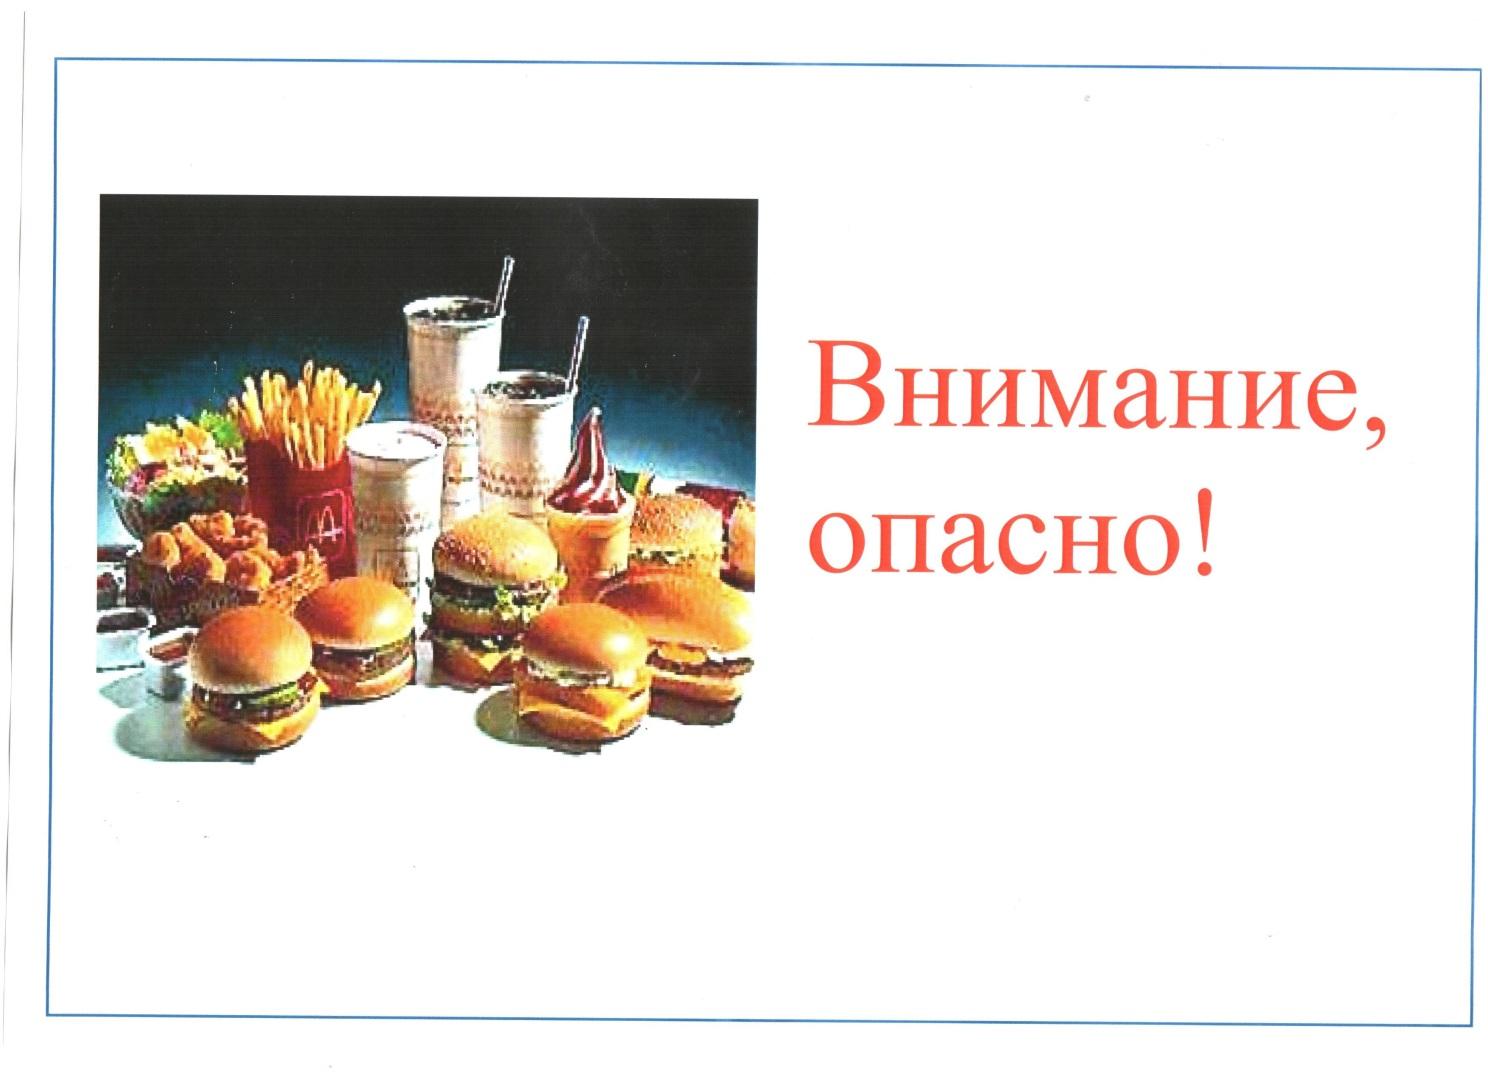 C:\Users\мария\Desktop\постер\4 постер 001.jpg